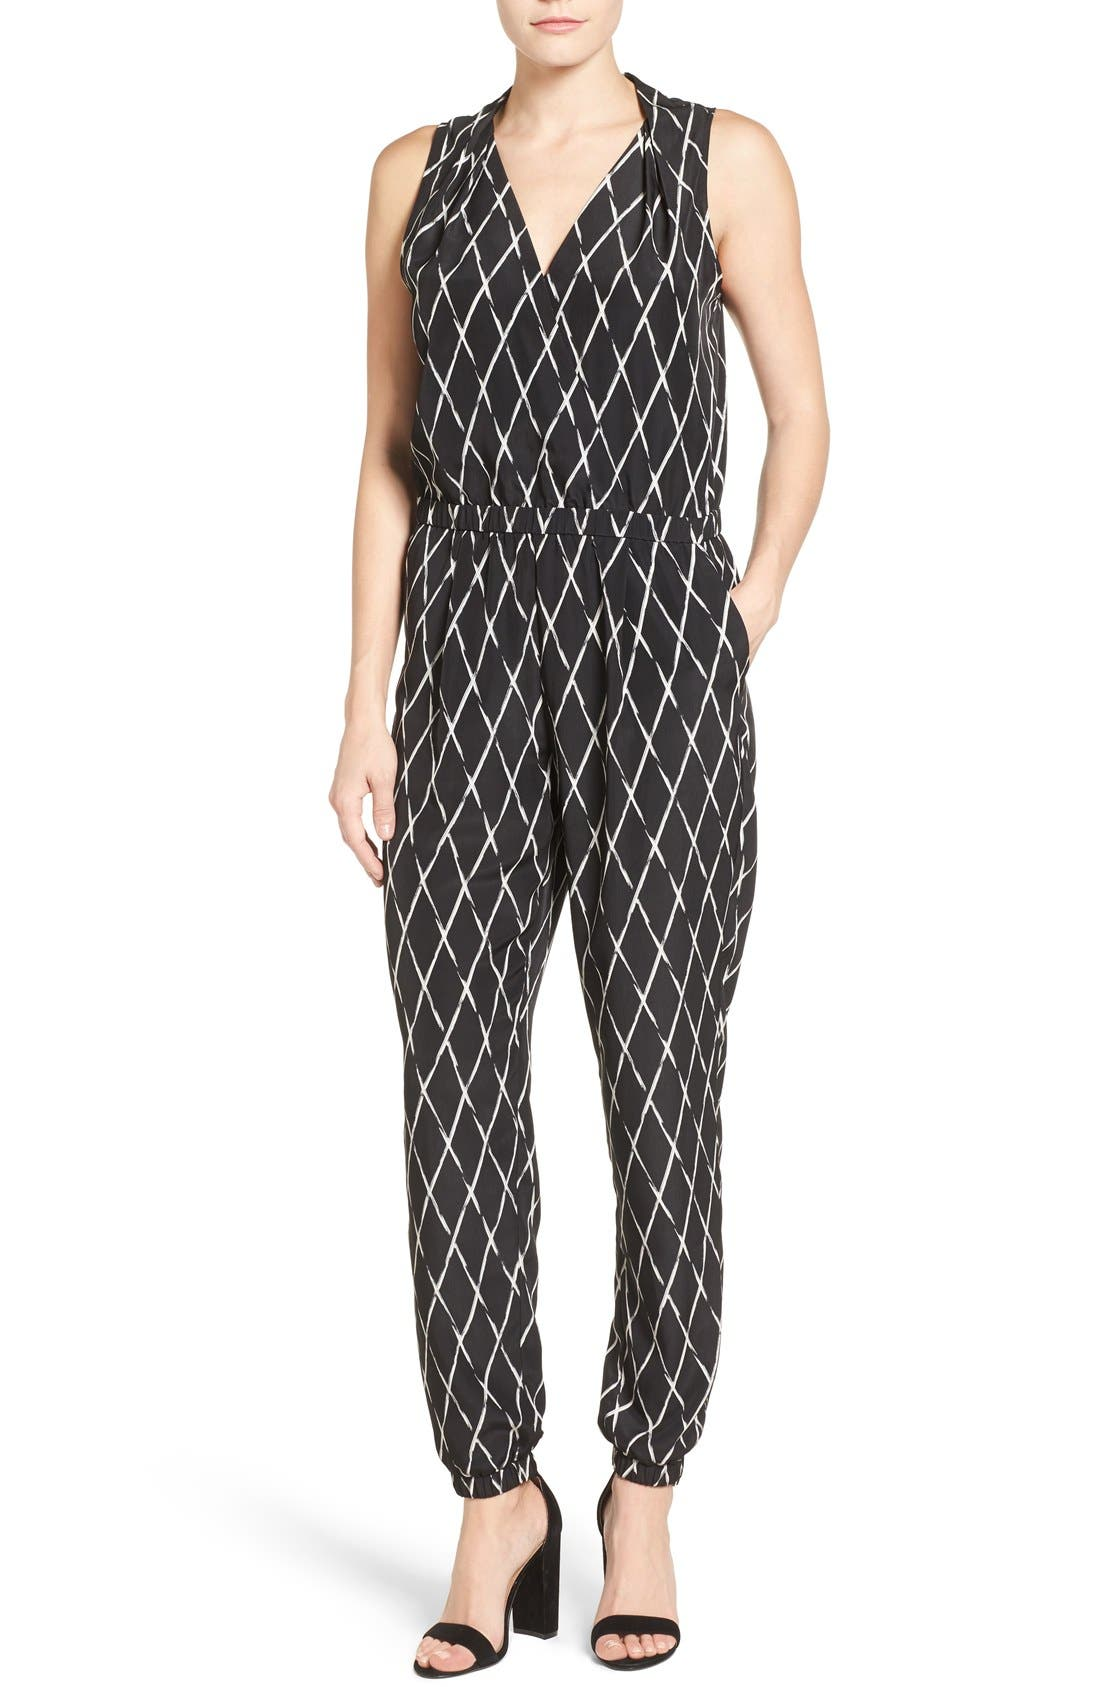 Alternate Image 1 Selected - Halogen® V-Neck Sleeveless Jumpsuit (Regular & Petite)